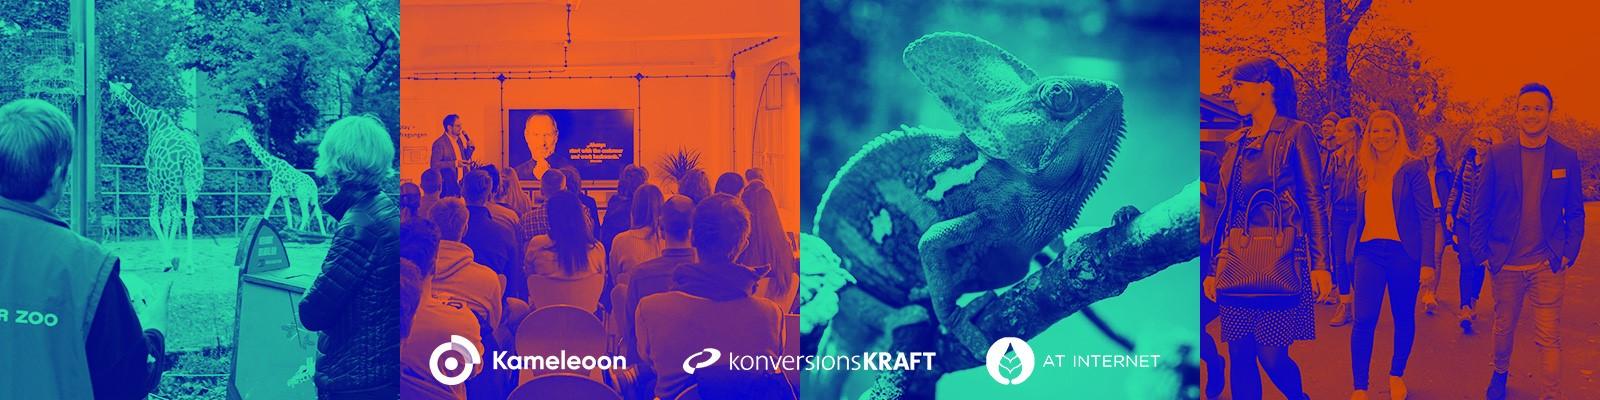 Conversion Safari_Kameleoon_konversionsKraft_AT-Internet